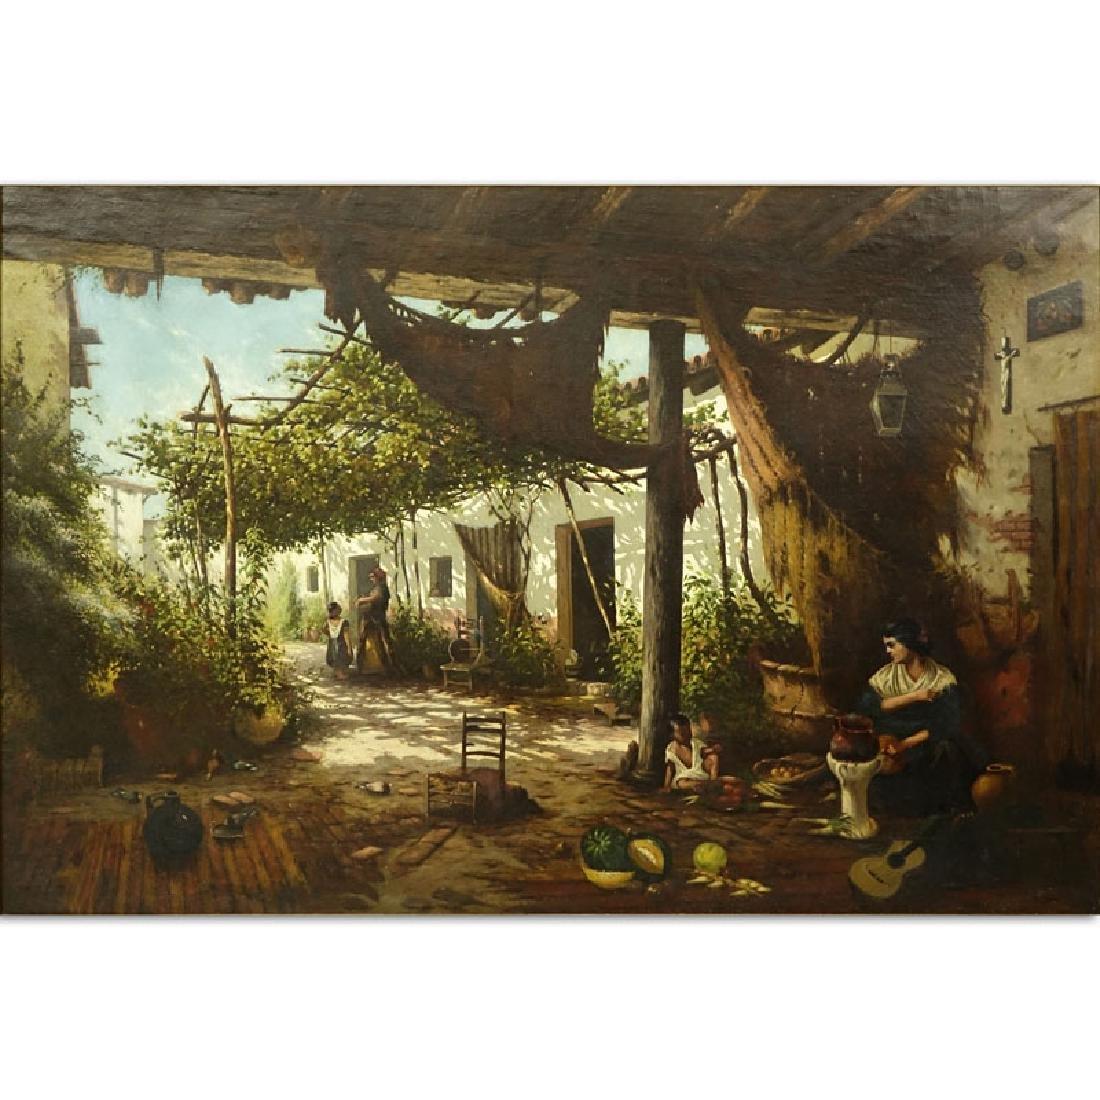 19/20th Century Spanish School Oil Painting On Canvas